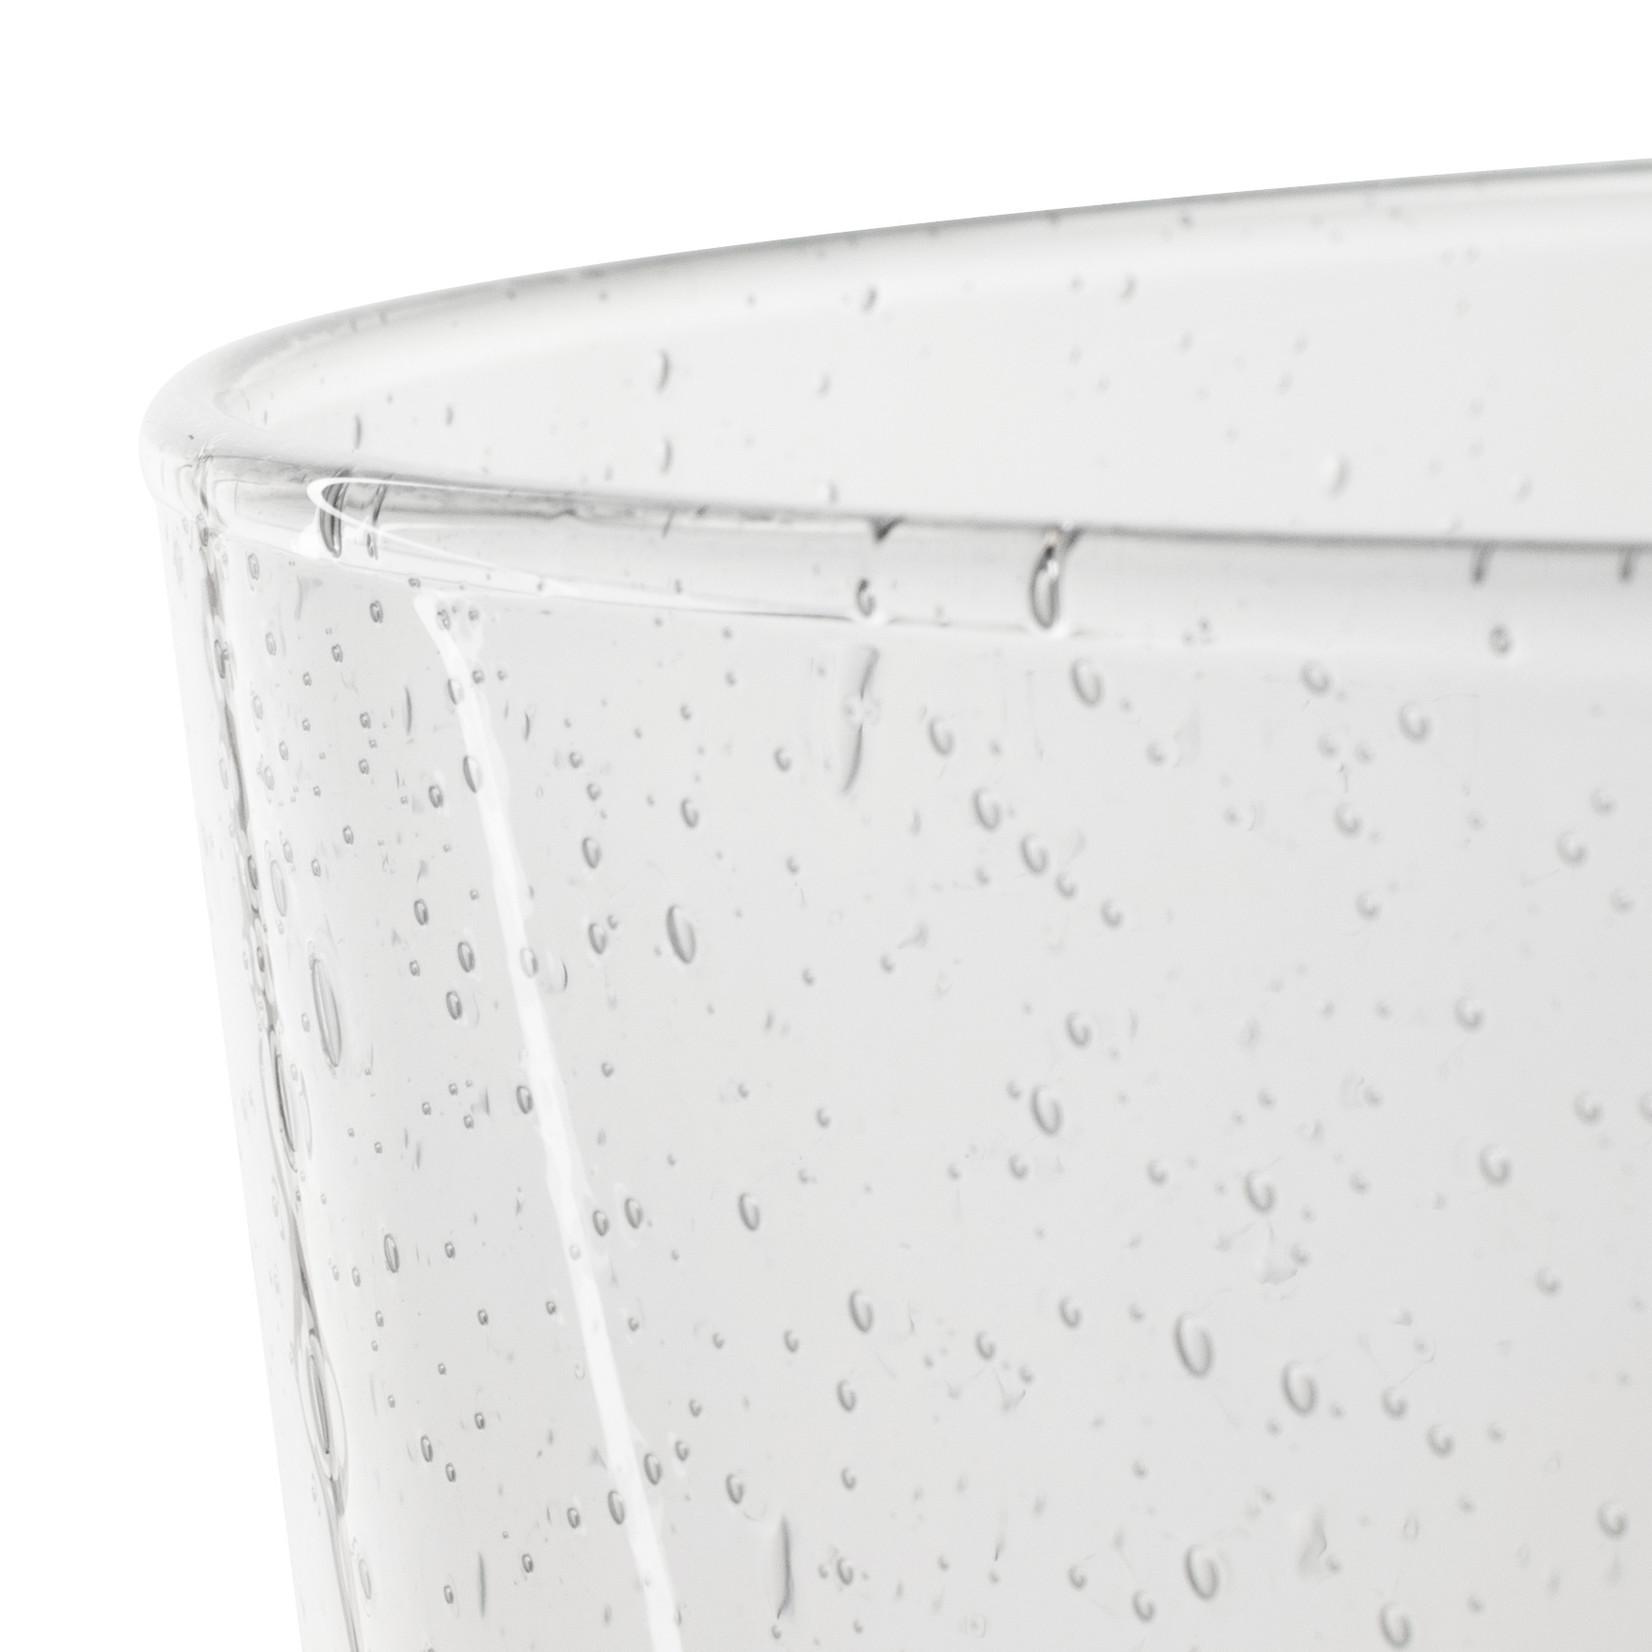 Jodeco Glass Design vaas 'Lexus' H24,5 D19 cm Transparant